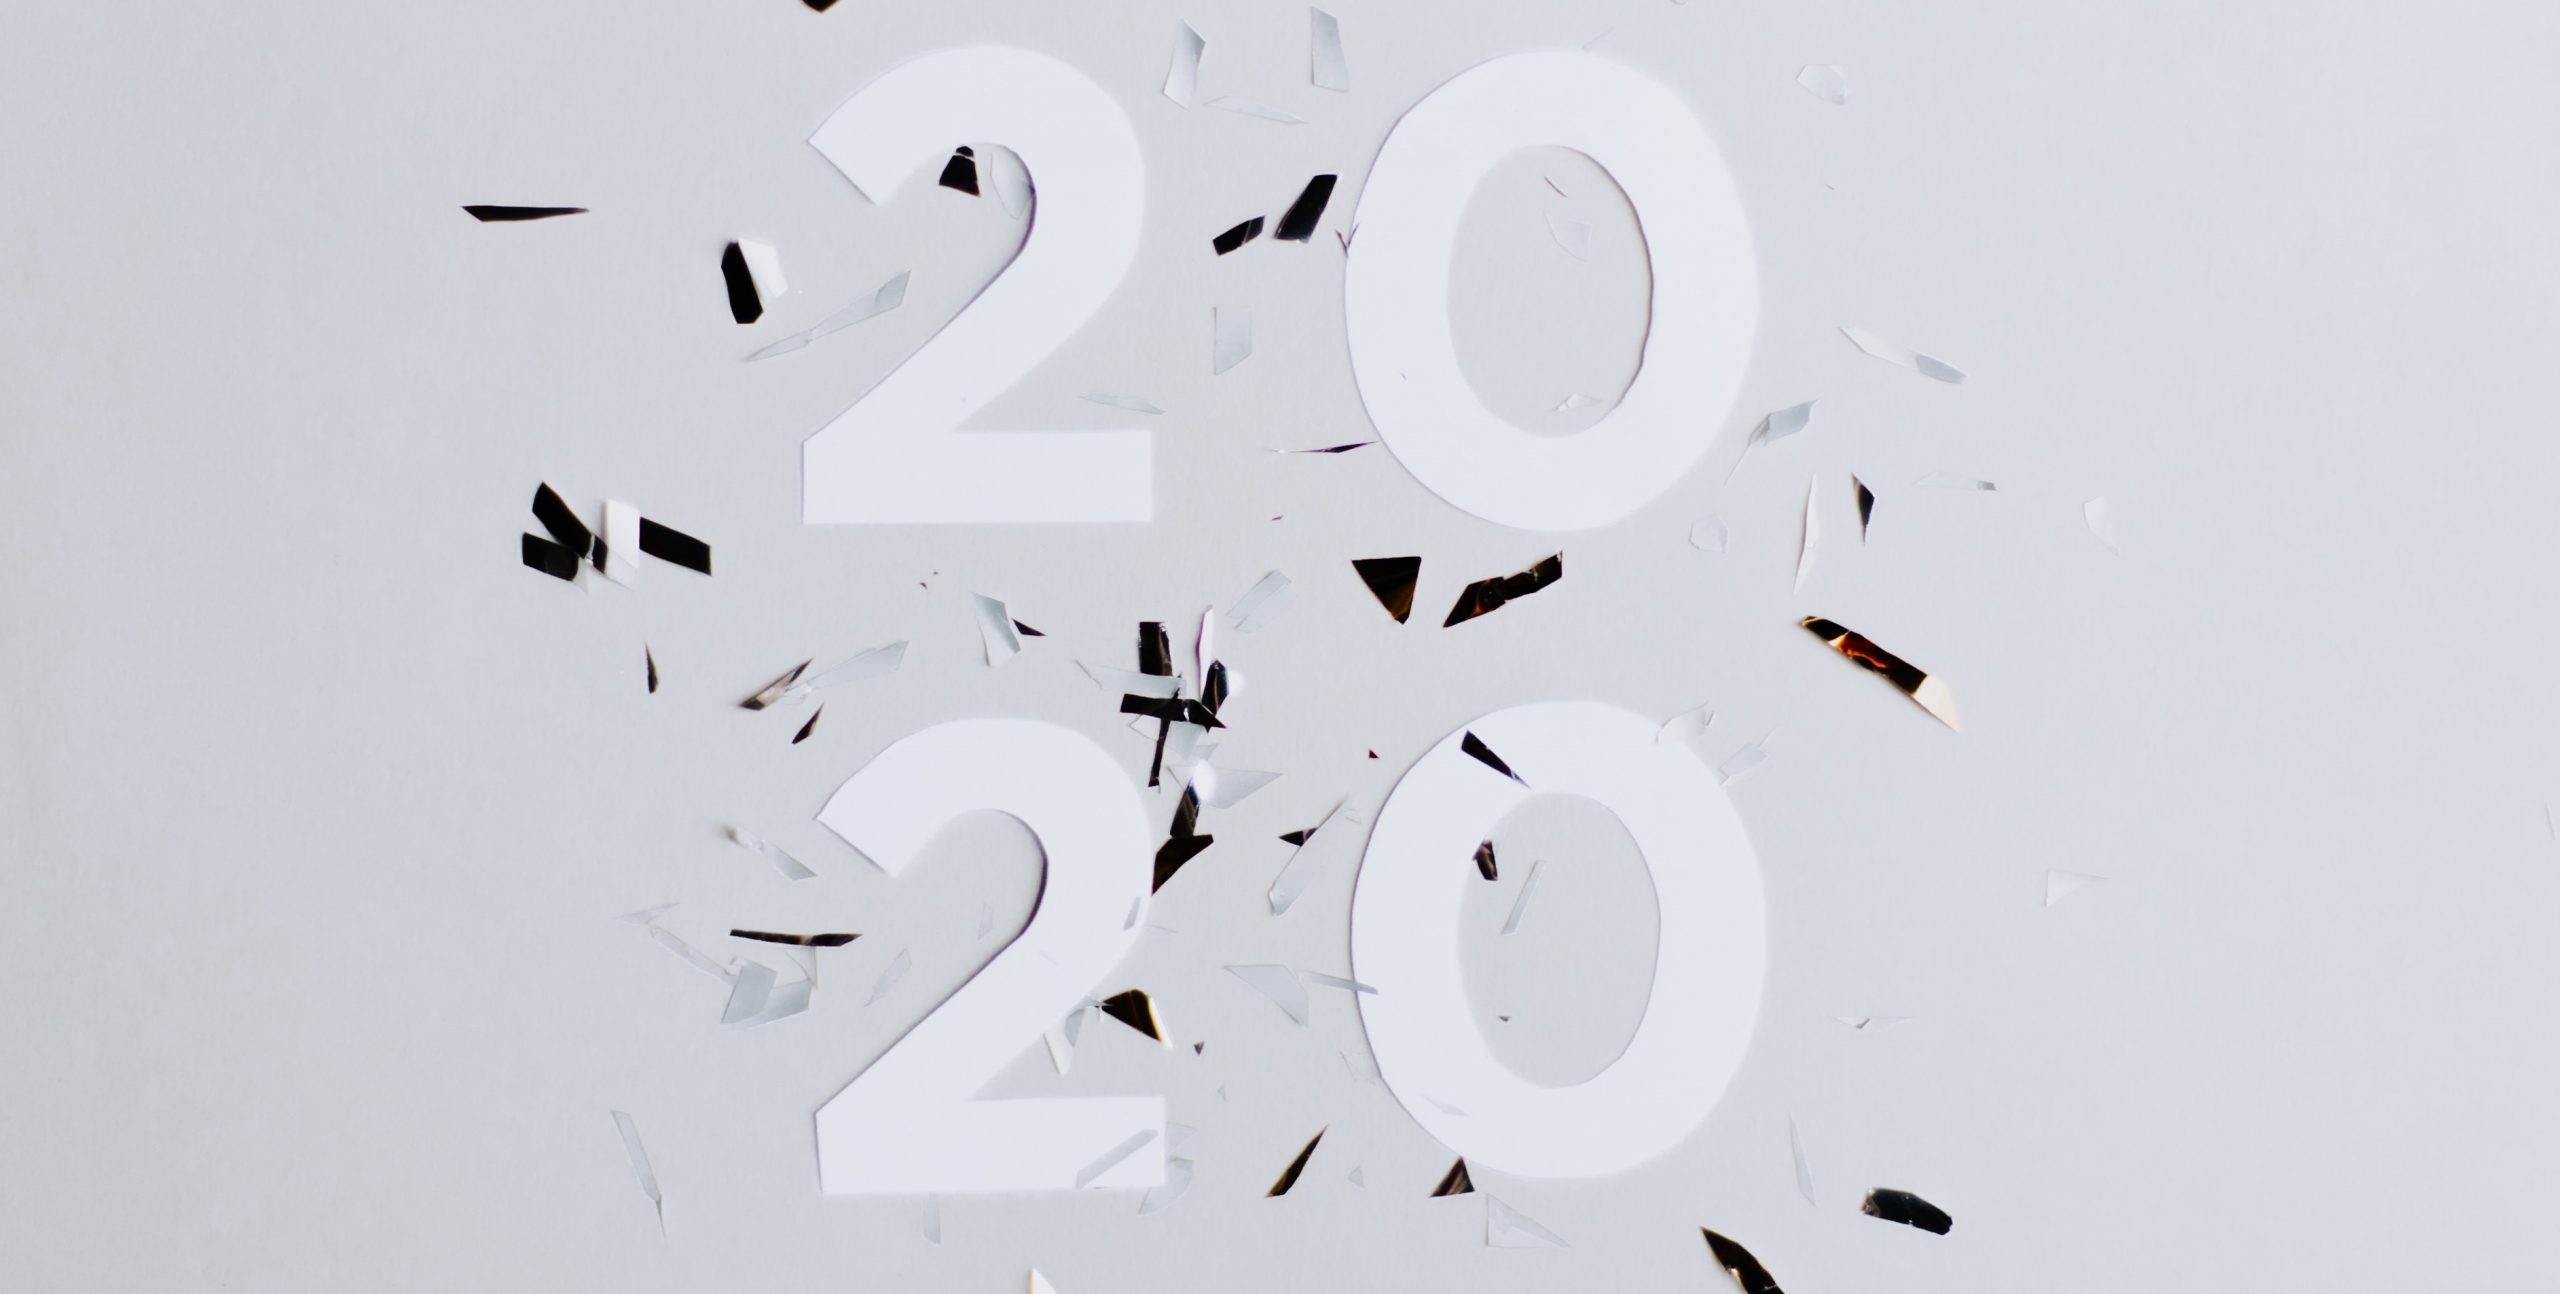 A New Decade For Horizon DataSys